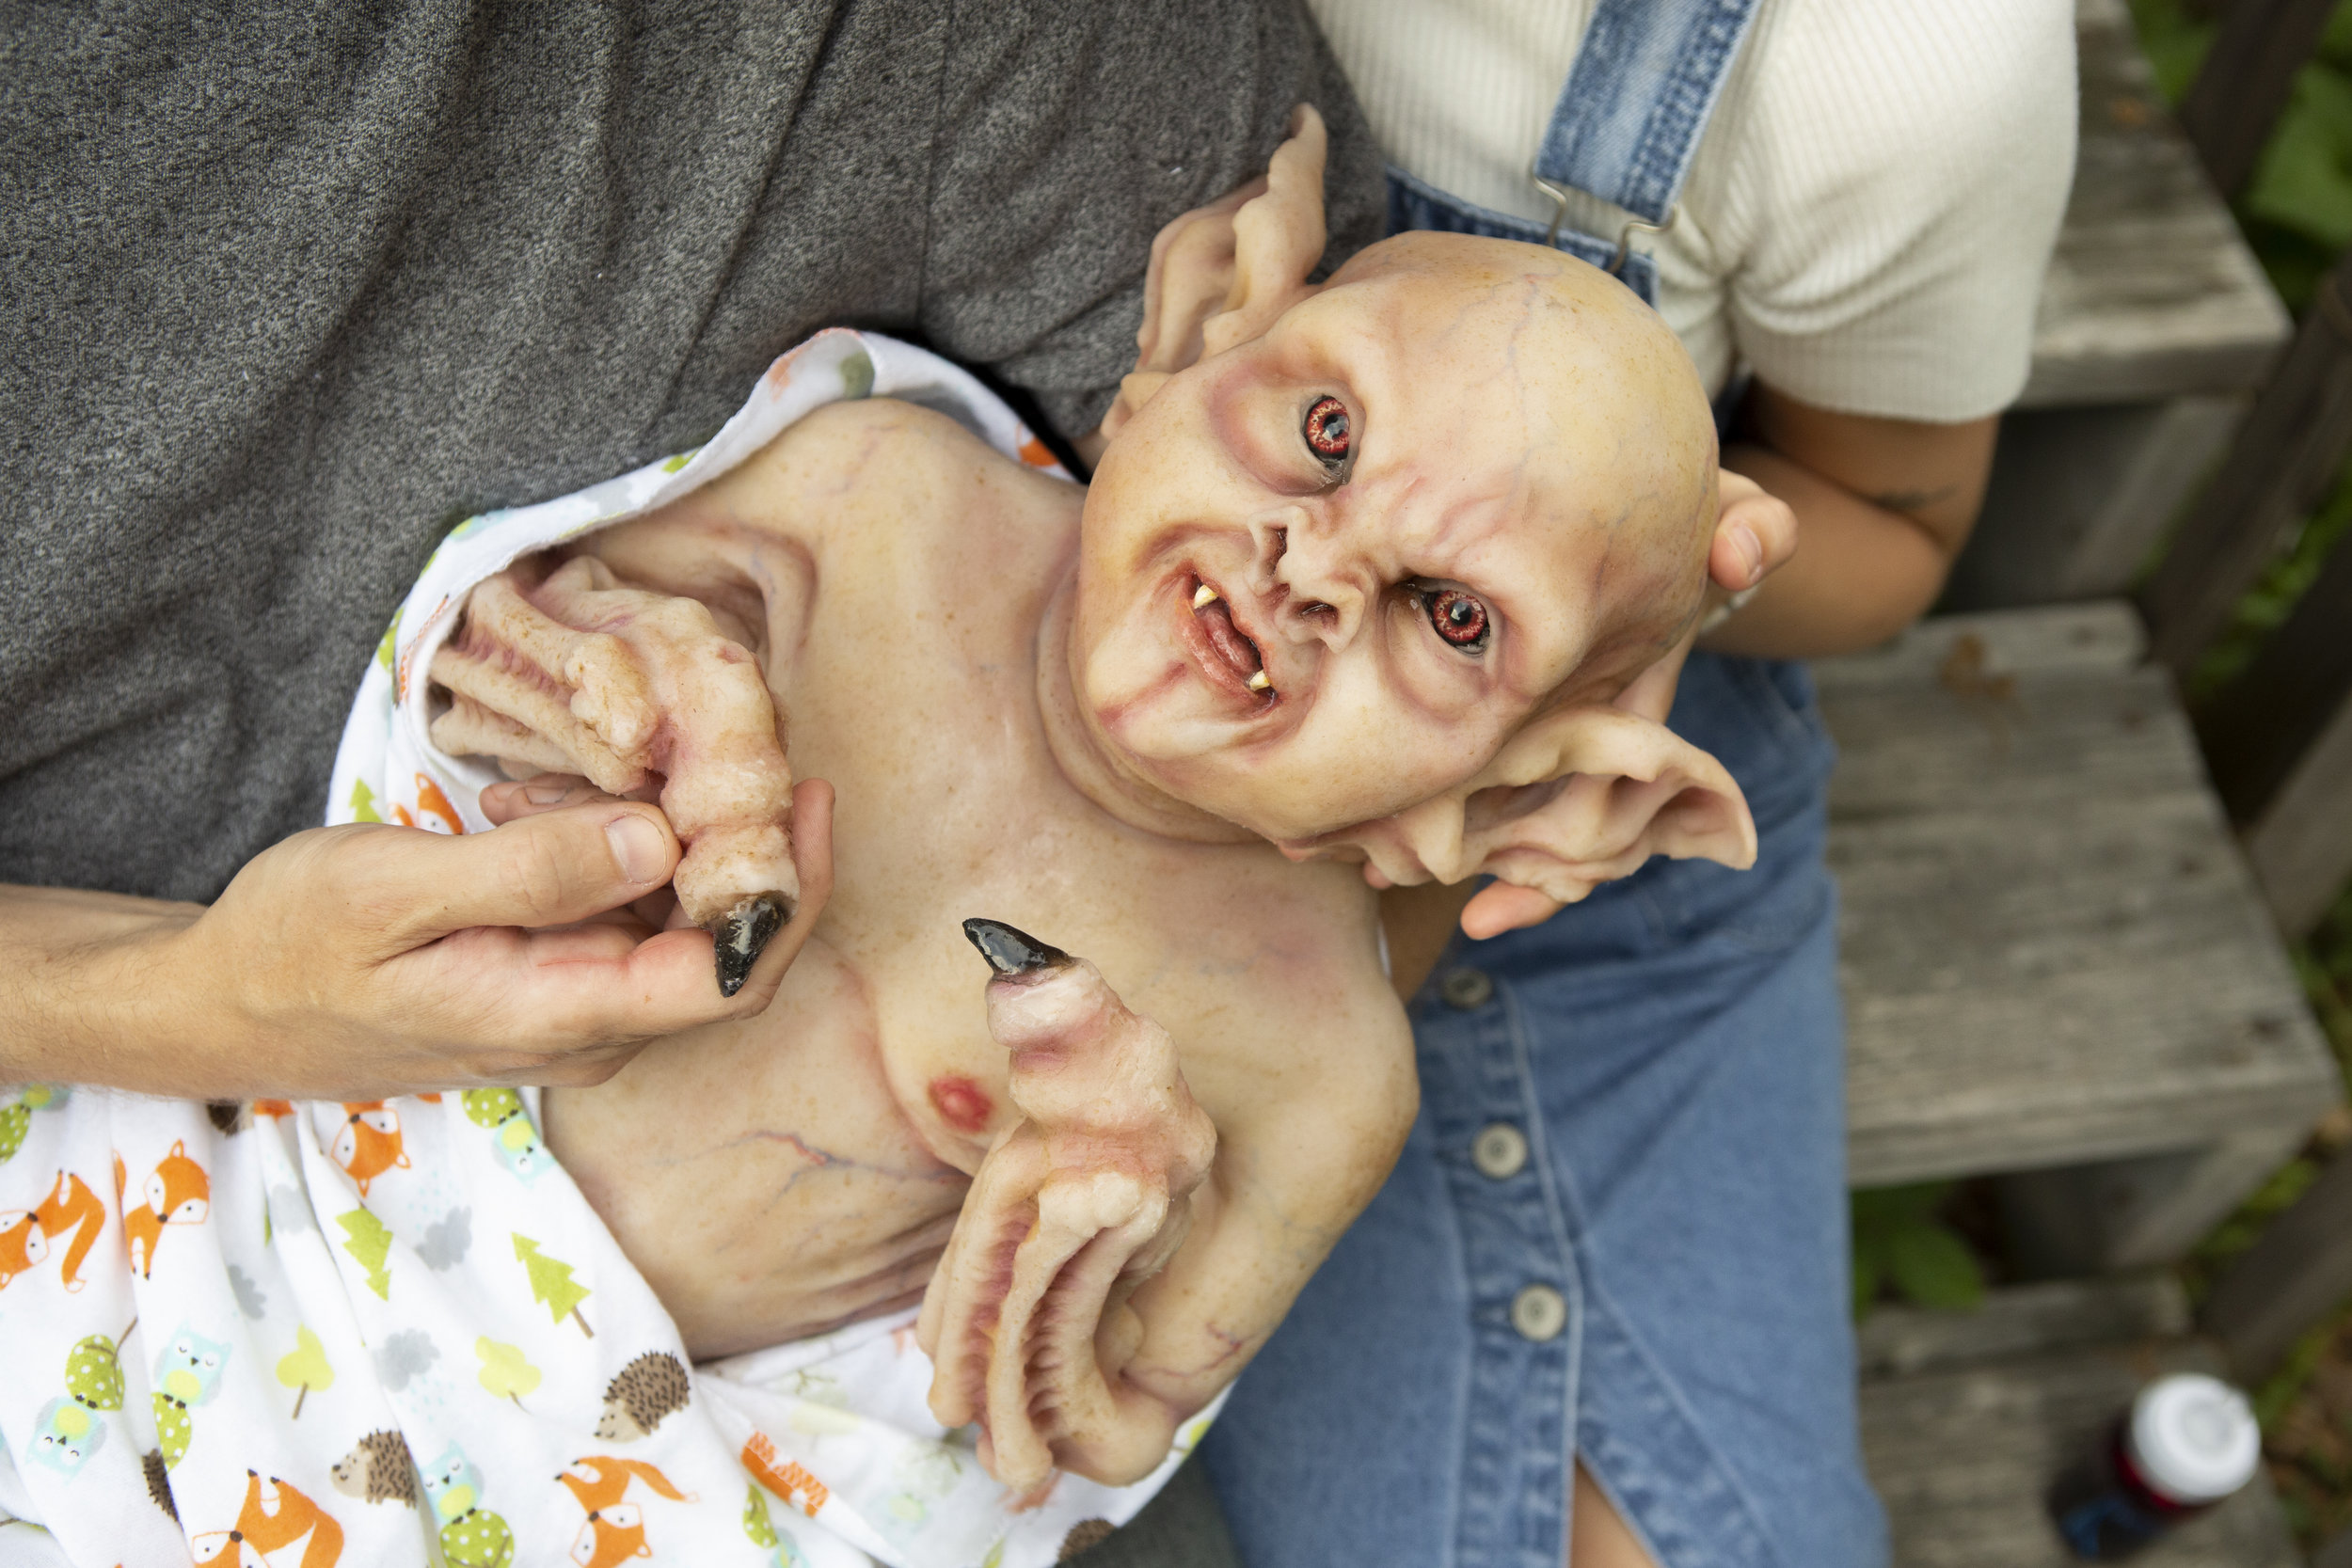 In Daddy's Arms | Newborn Vampire  | Newborn photoshoot | Ravendark Creations Vampire Baby | Newborn Photoshoots | Alyssia Booth's Candid & Studio | www.abcandidstudio.com